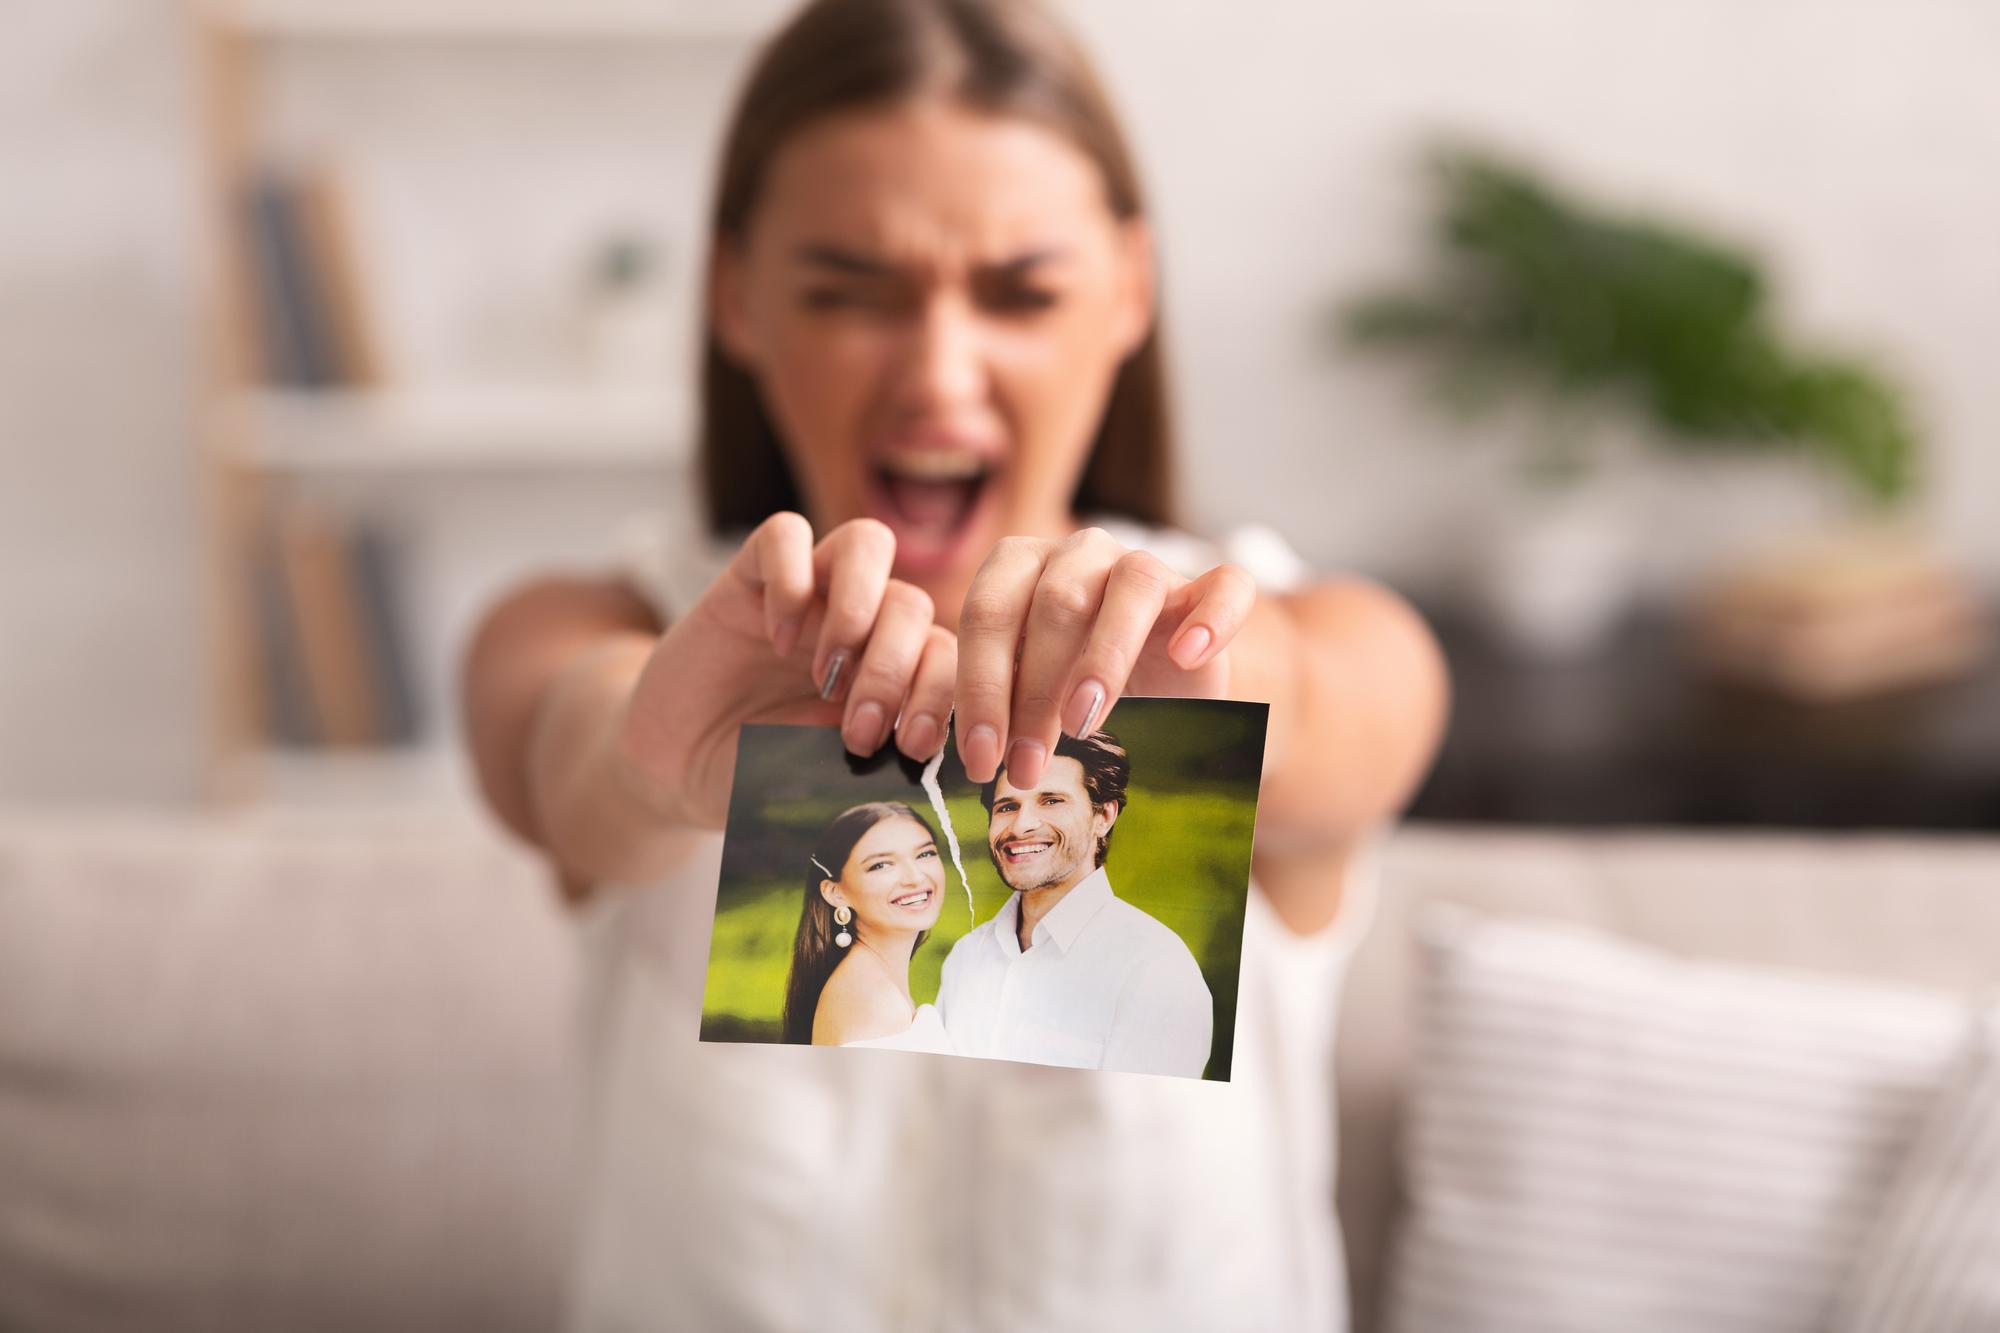 Furious Woman Ripping Wedding Photo Sitting On Sofa Indoor